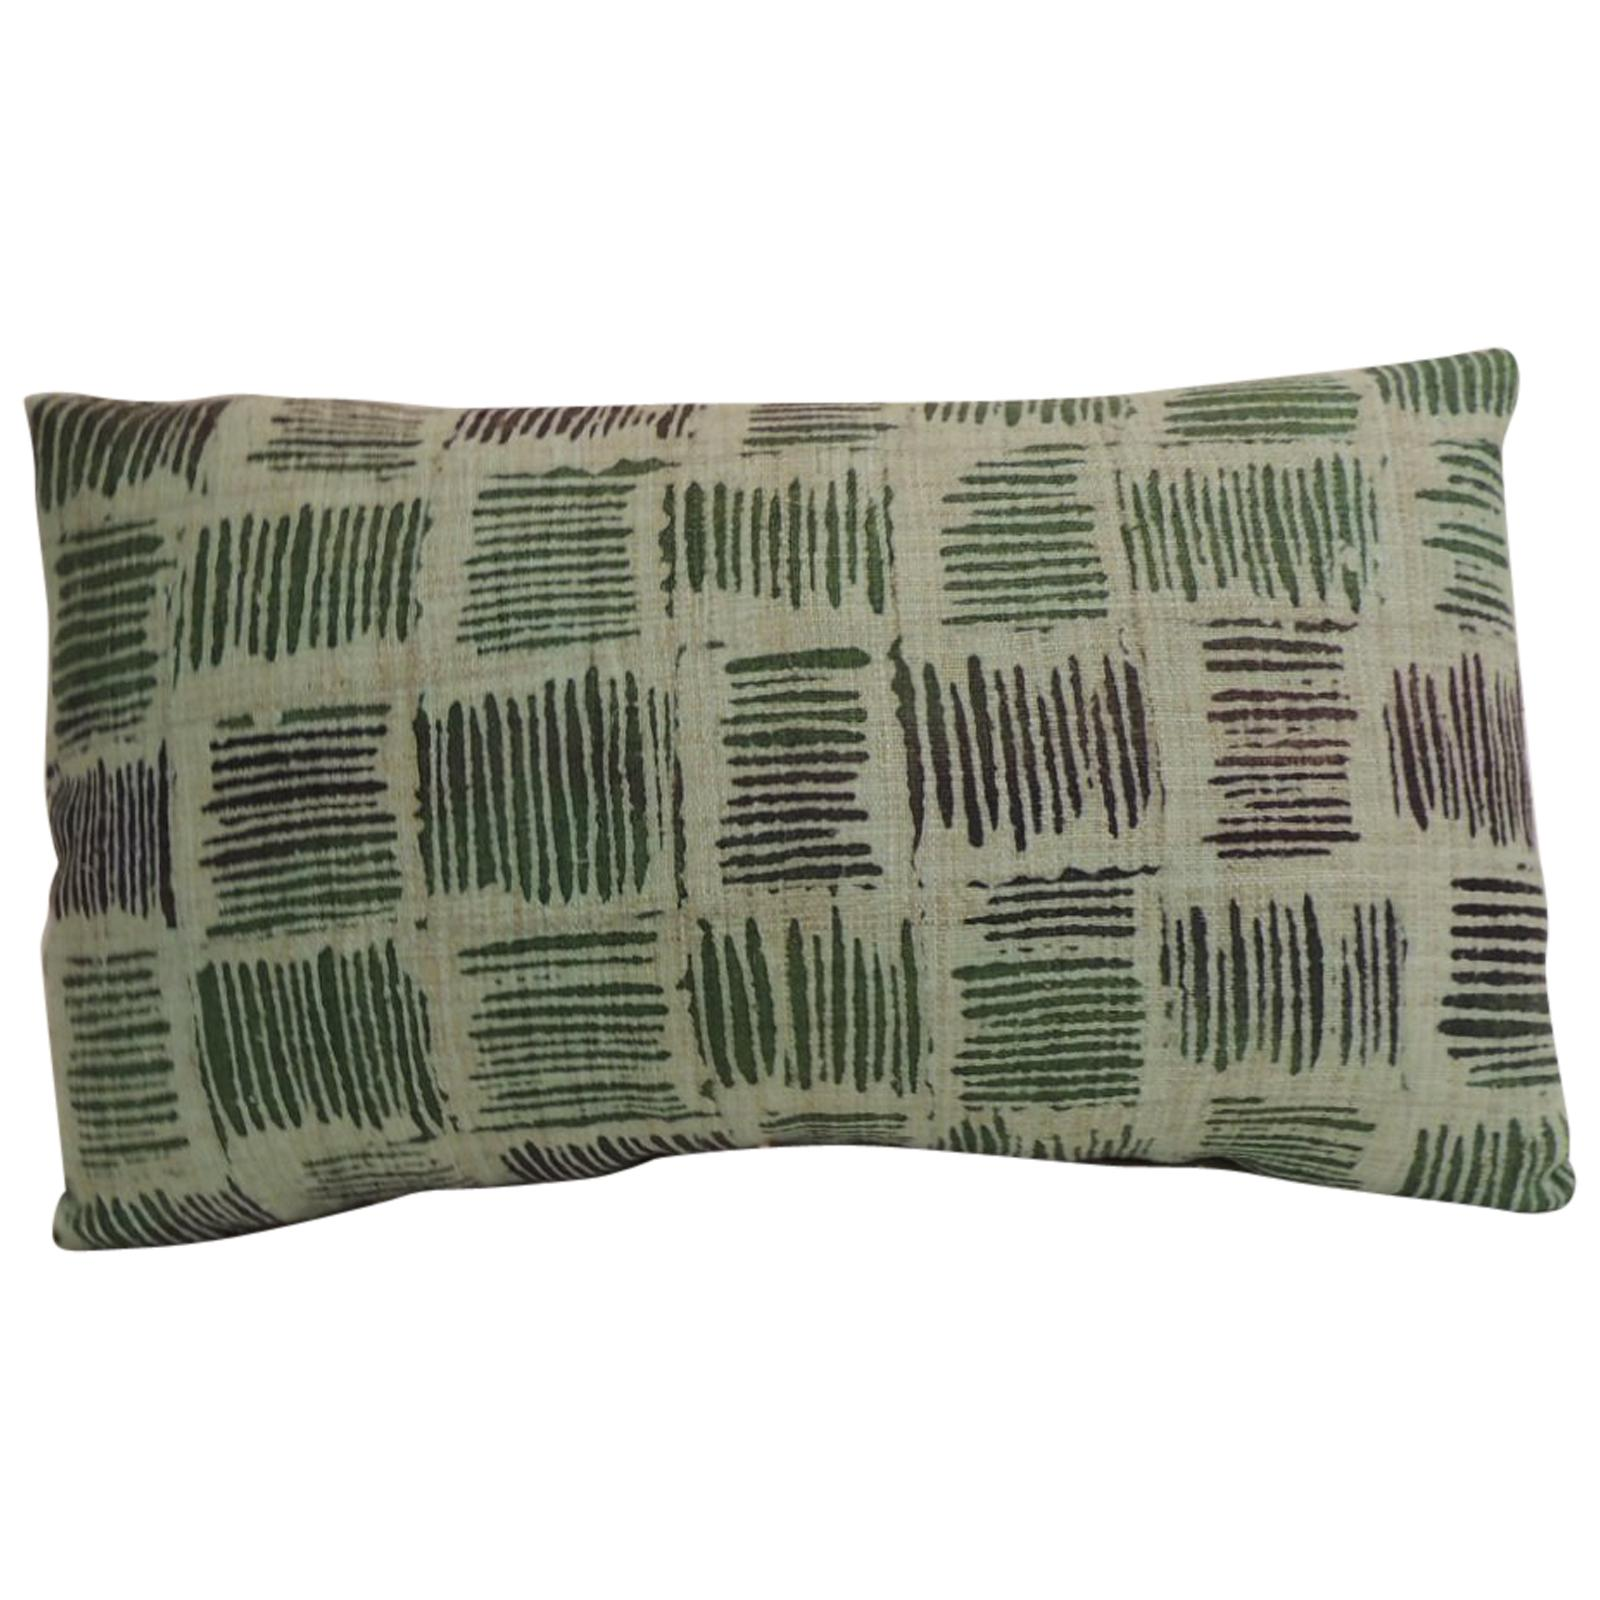 Vintage Hand Blocked Green and Black Decorative Lumbar Pillow